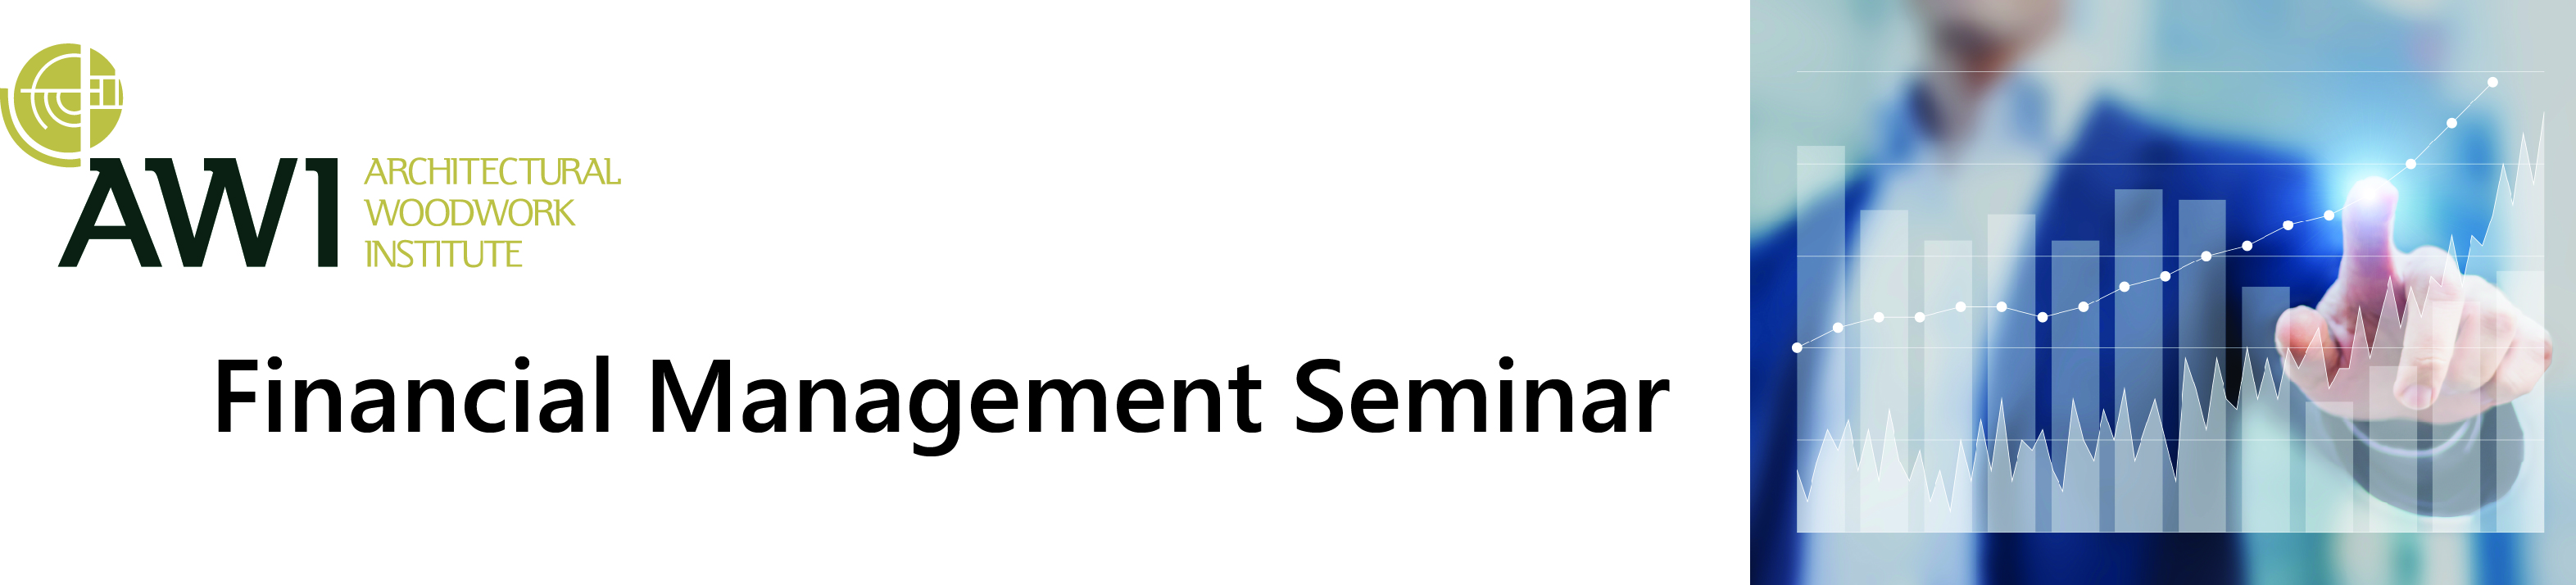 AWI Financial Management Seminar - Iowa/Nebraska Chapter - October 2017